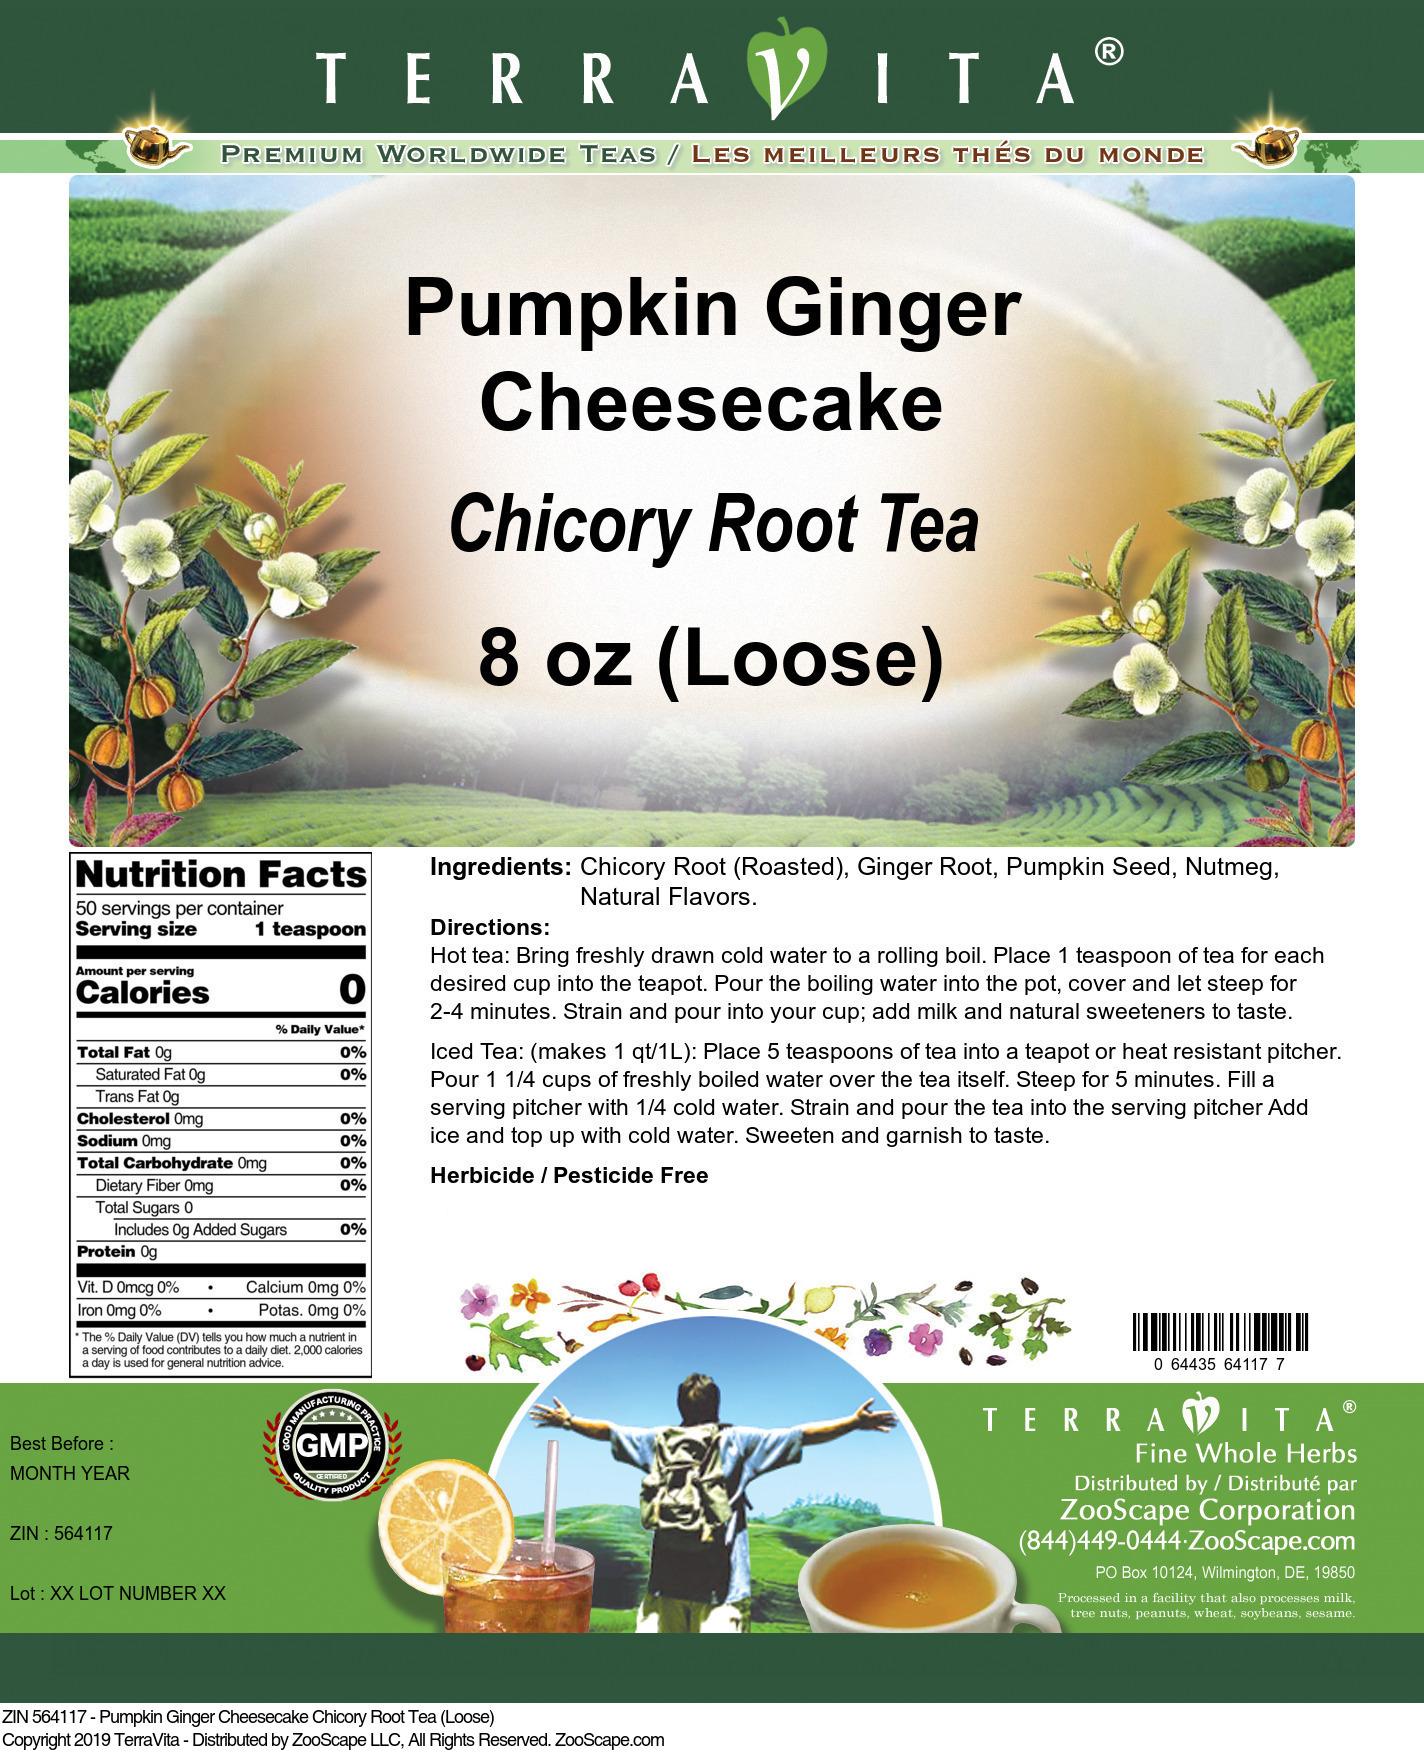 Pumpkin Ginger Cheesecake Chicory Root Tea (Loose)